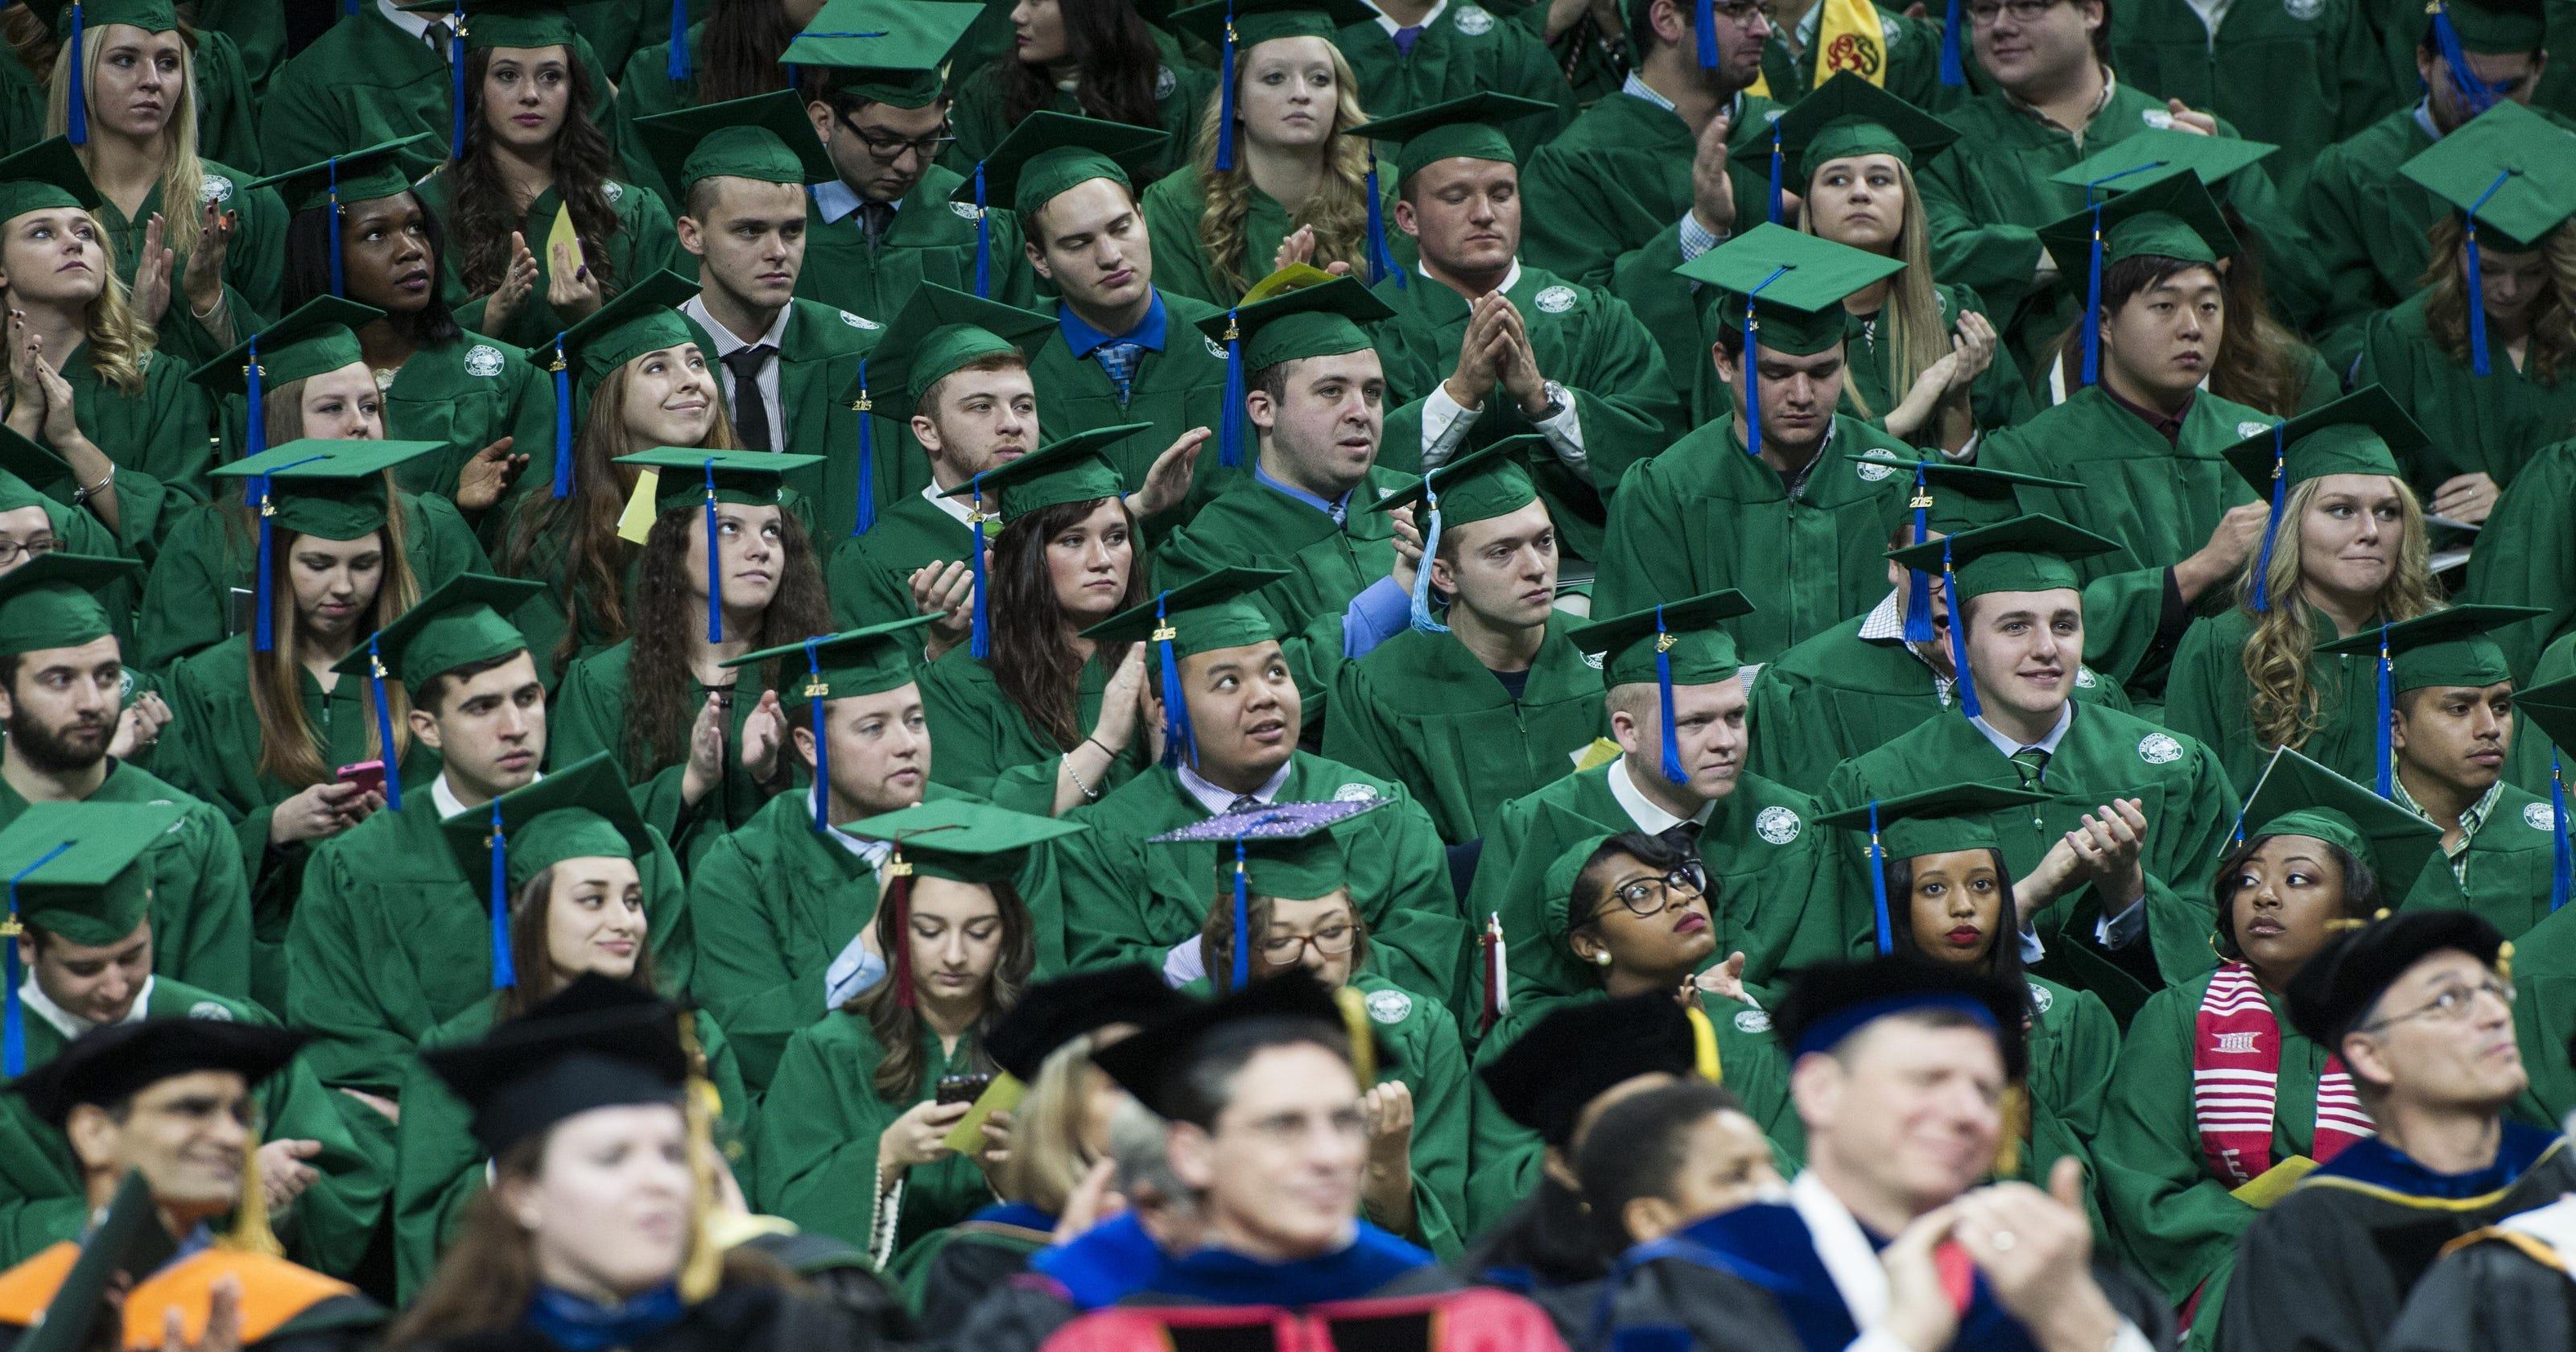 Tips for surviving MSU graduation weekend